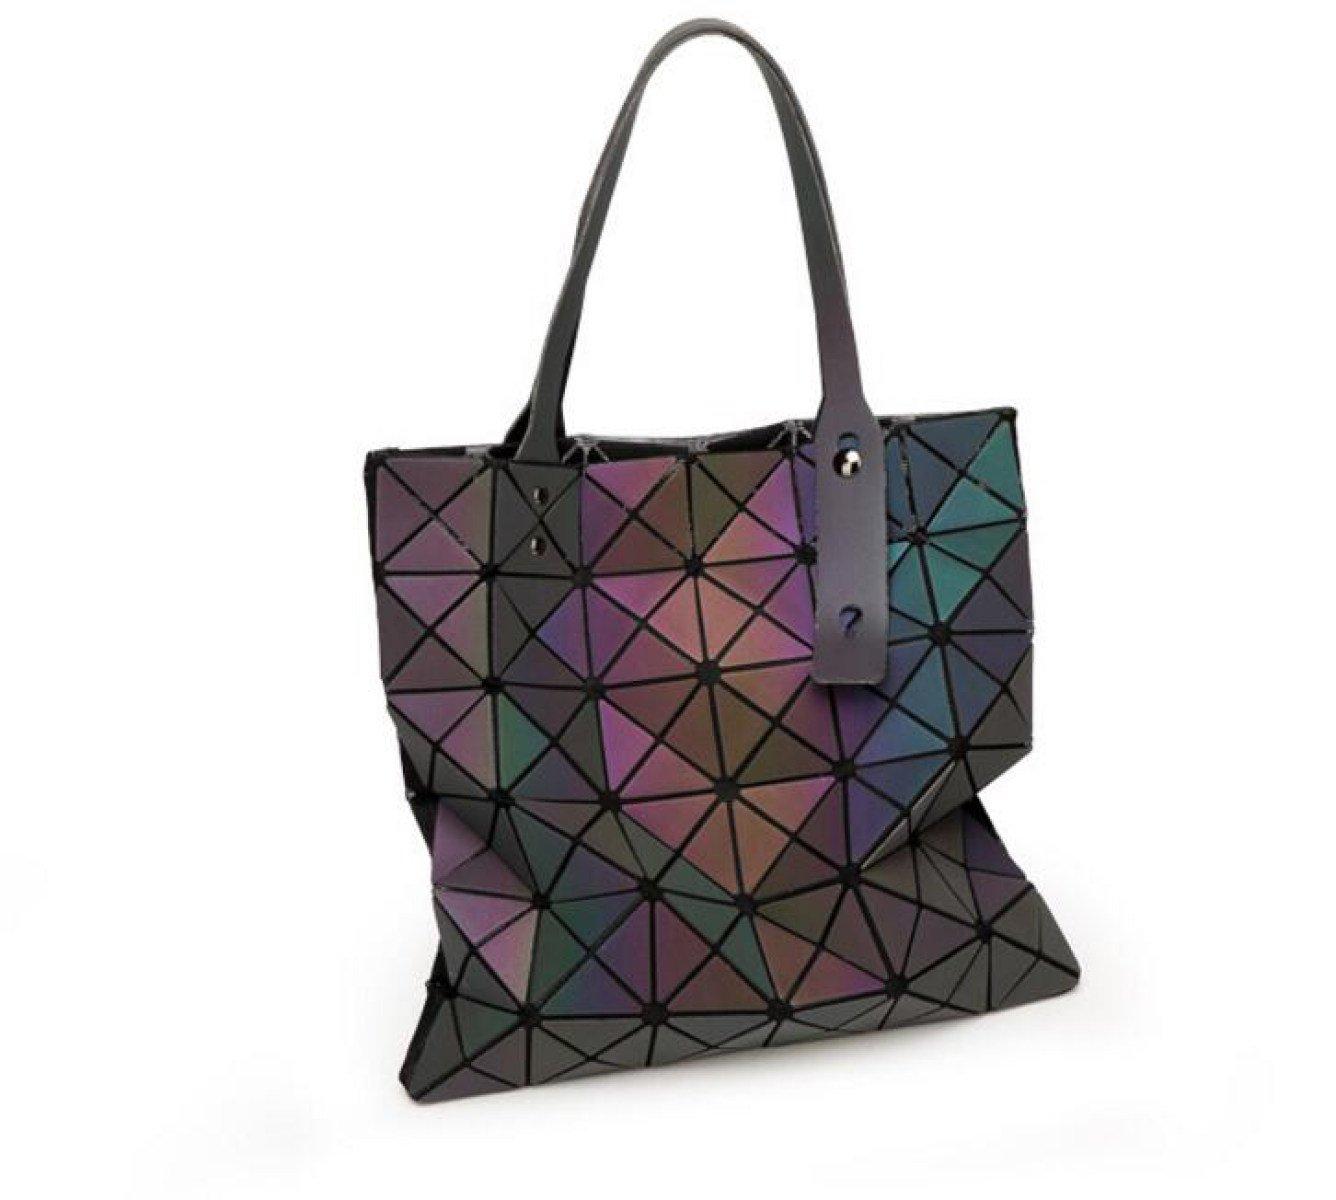 GXYLLDSdjb Luminous Geometric Bag Women s Handbags Shoulder Bags Ladies  Purses Messenge Bags Briefcases Girls Daily Bags 33 33cm de069dccfc6cd